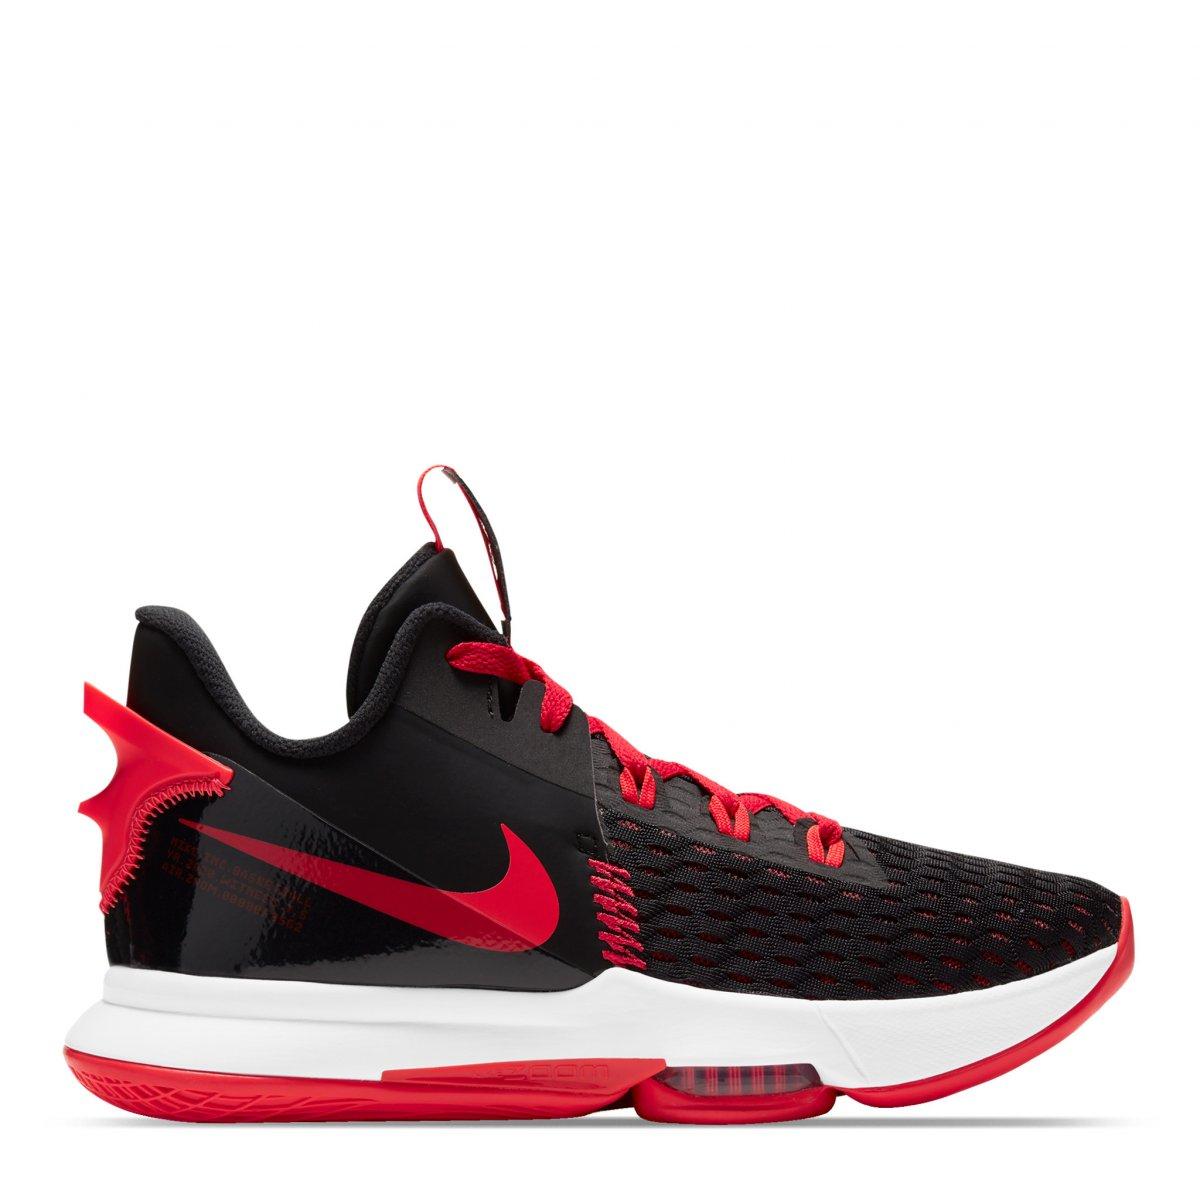 INNOVASPORT Tenis Nike LeBron Witness 5 Bred